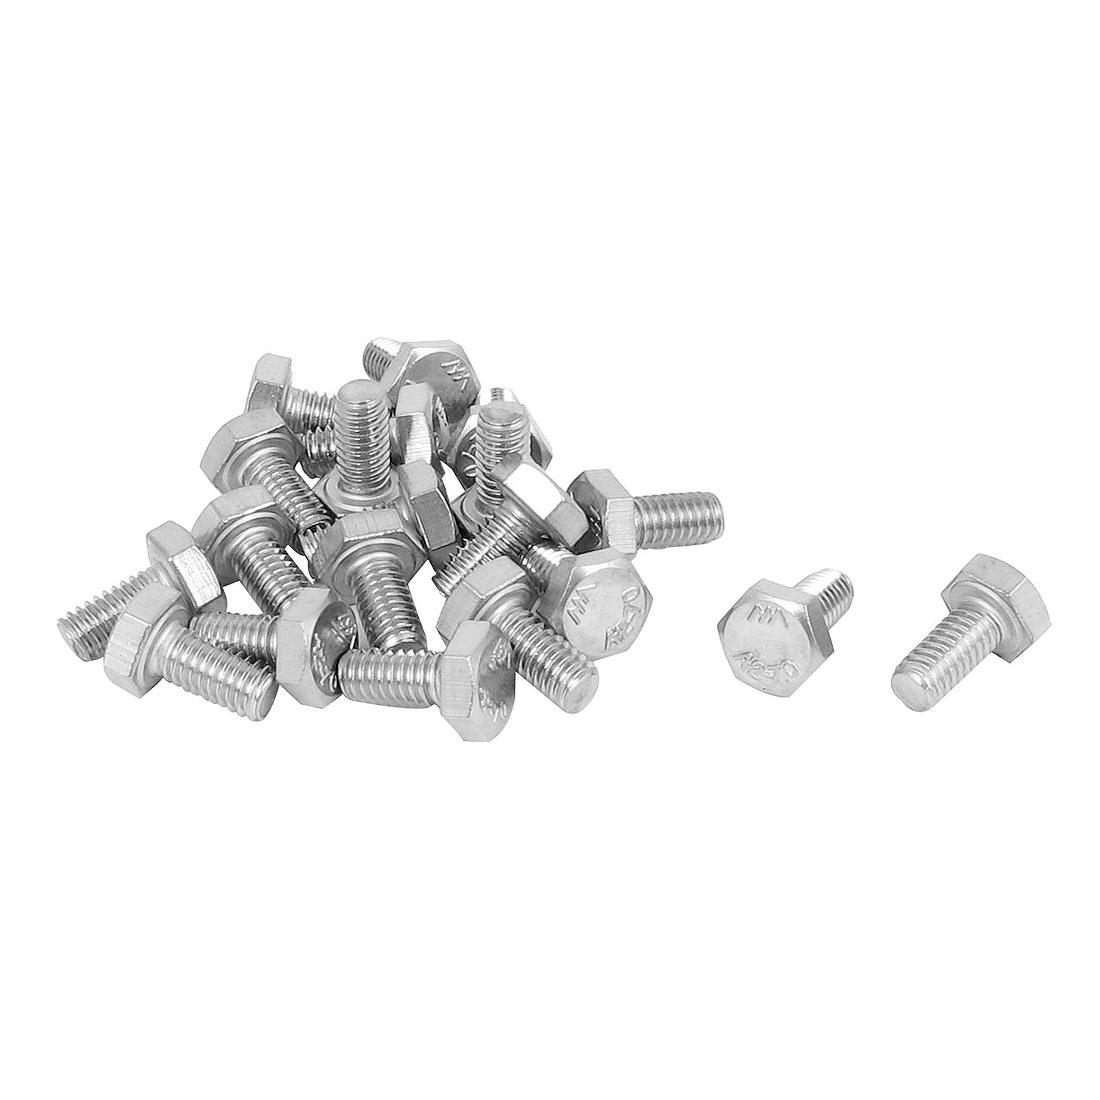 M4x8mm Thread 304 Stainless Steel Hex Hexagon Head Screw Bolt 20pcs